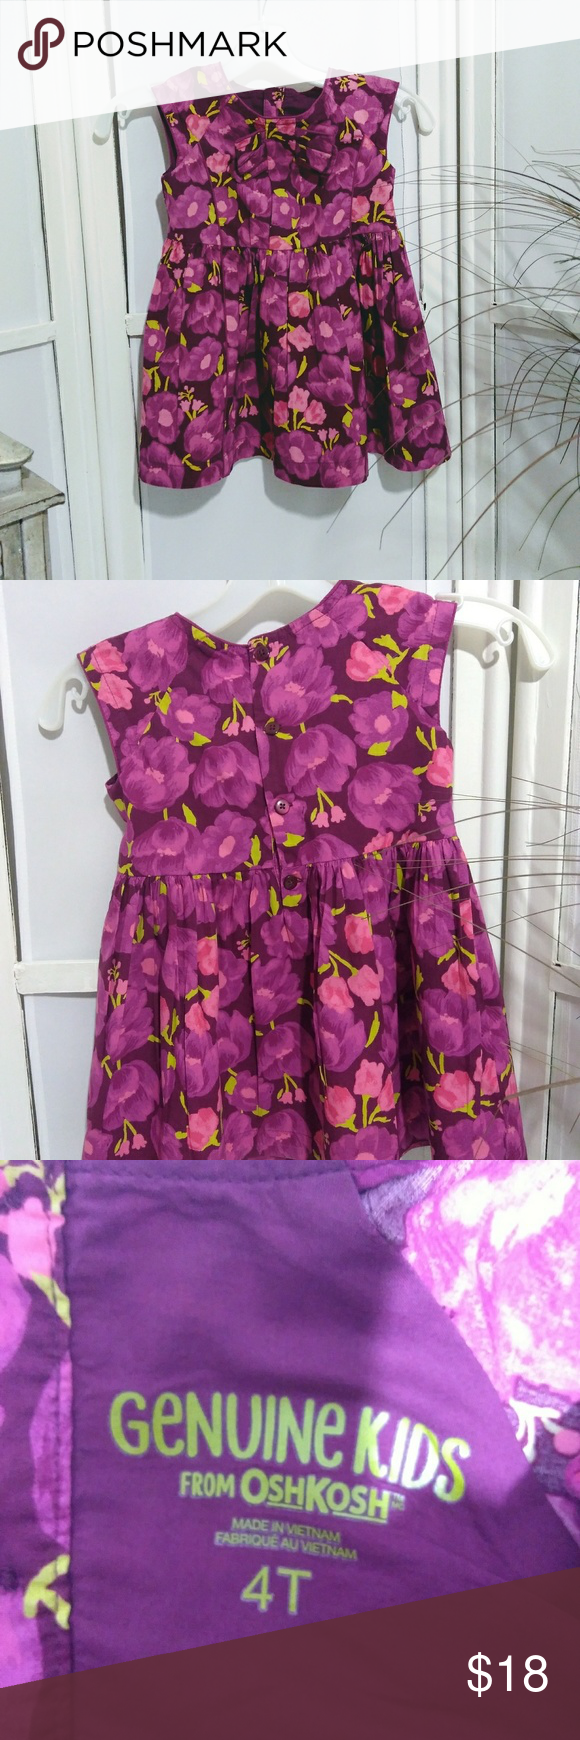 Genuine Kids Size 4t Burgundy Pink Lime Dress Dresses Kids Dresses Casual Dresses [ 1740 x 580 Pixel ]